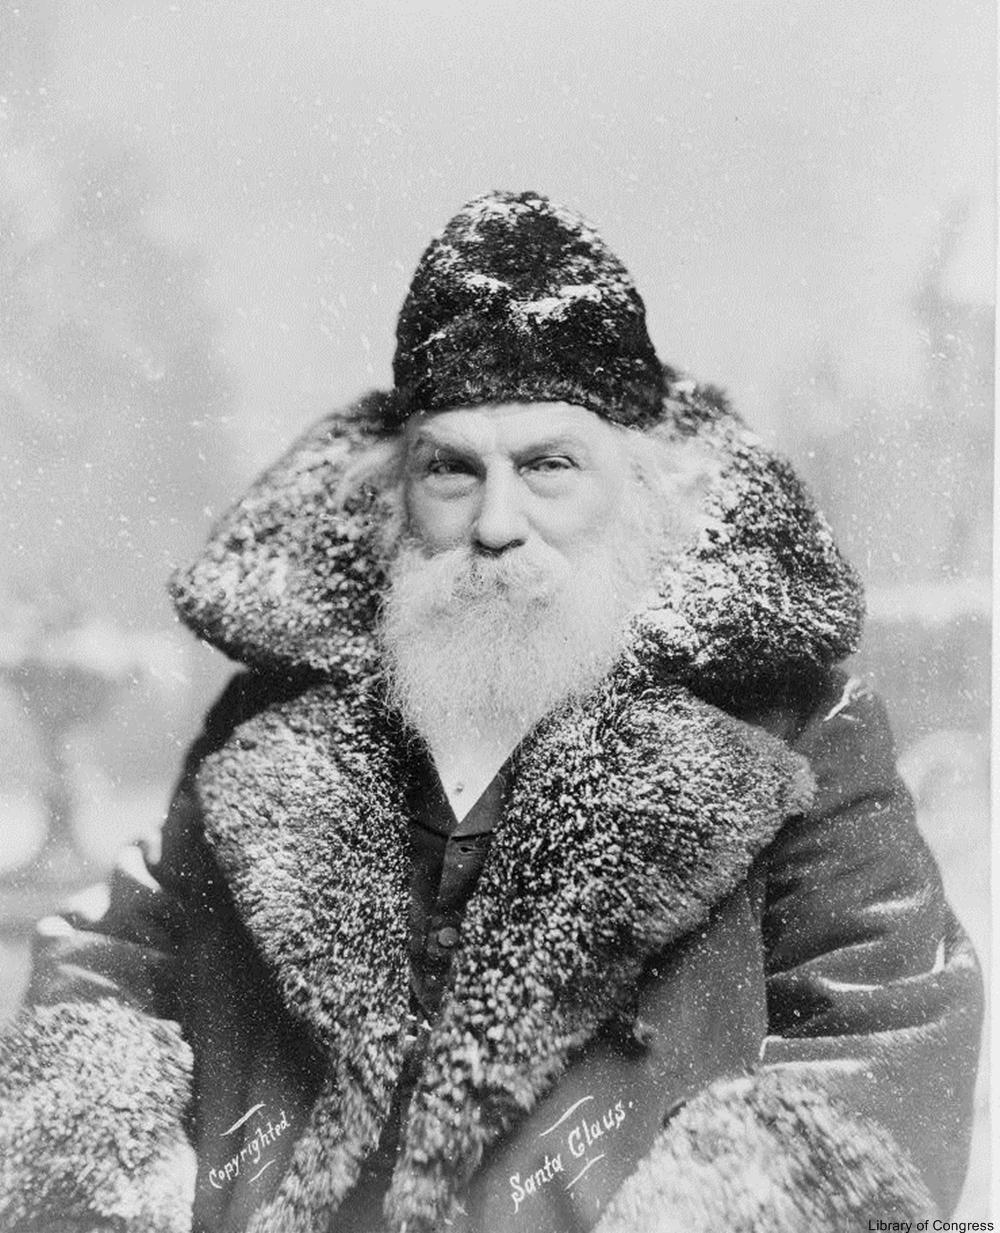 1890s Santa is quite somber